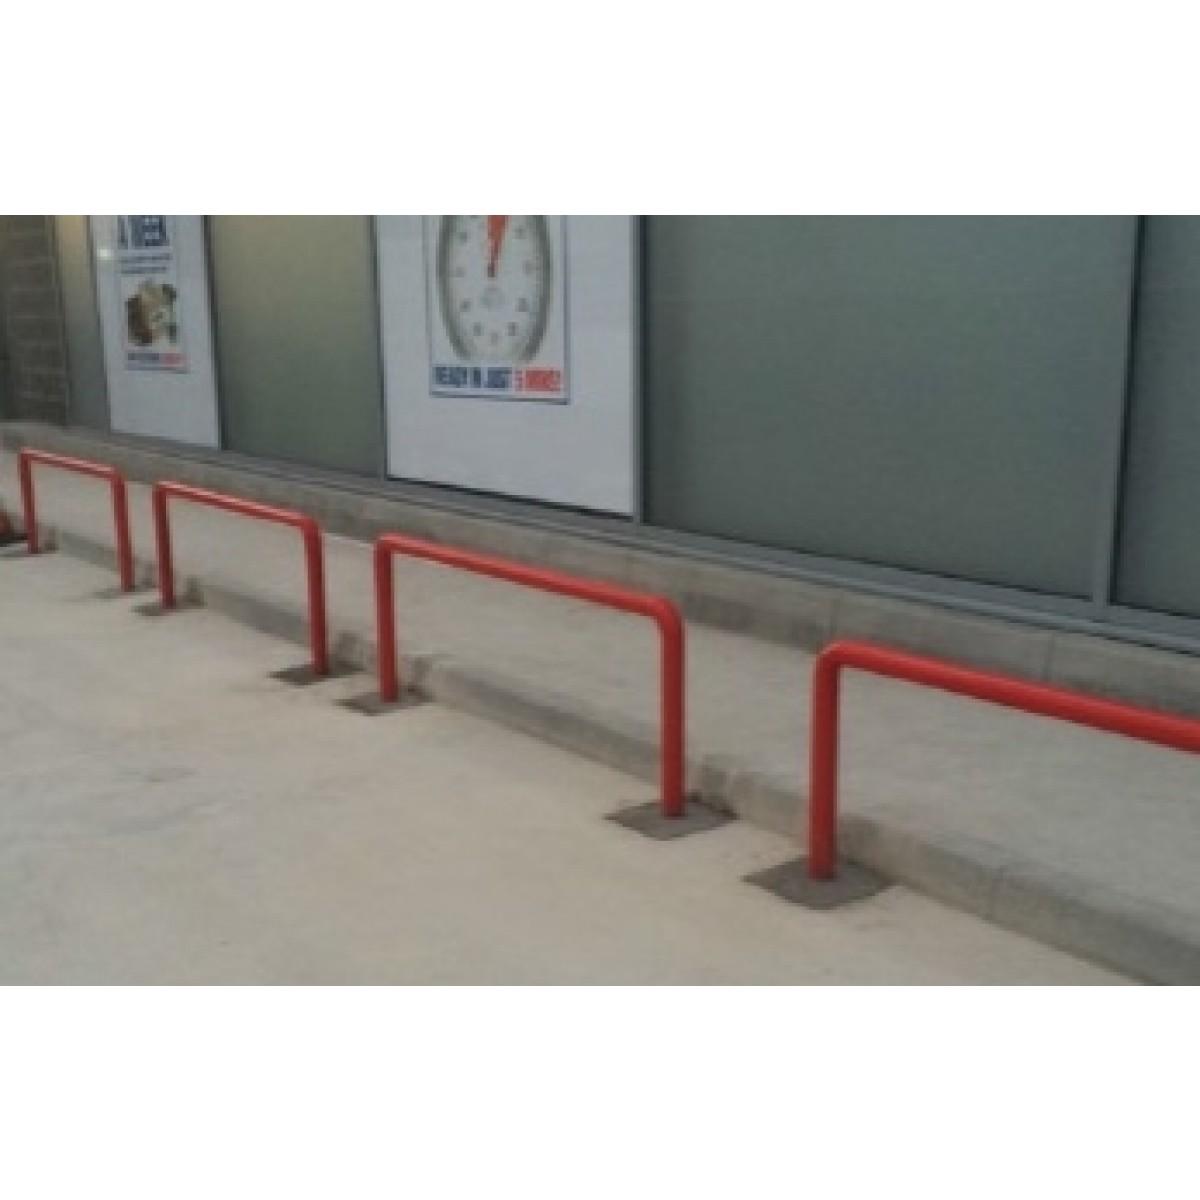 60mm Diameter Hoop Barrier